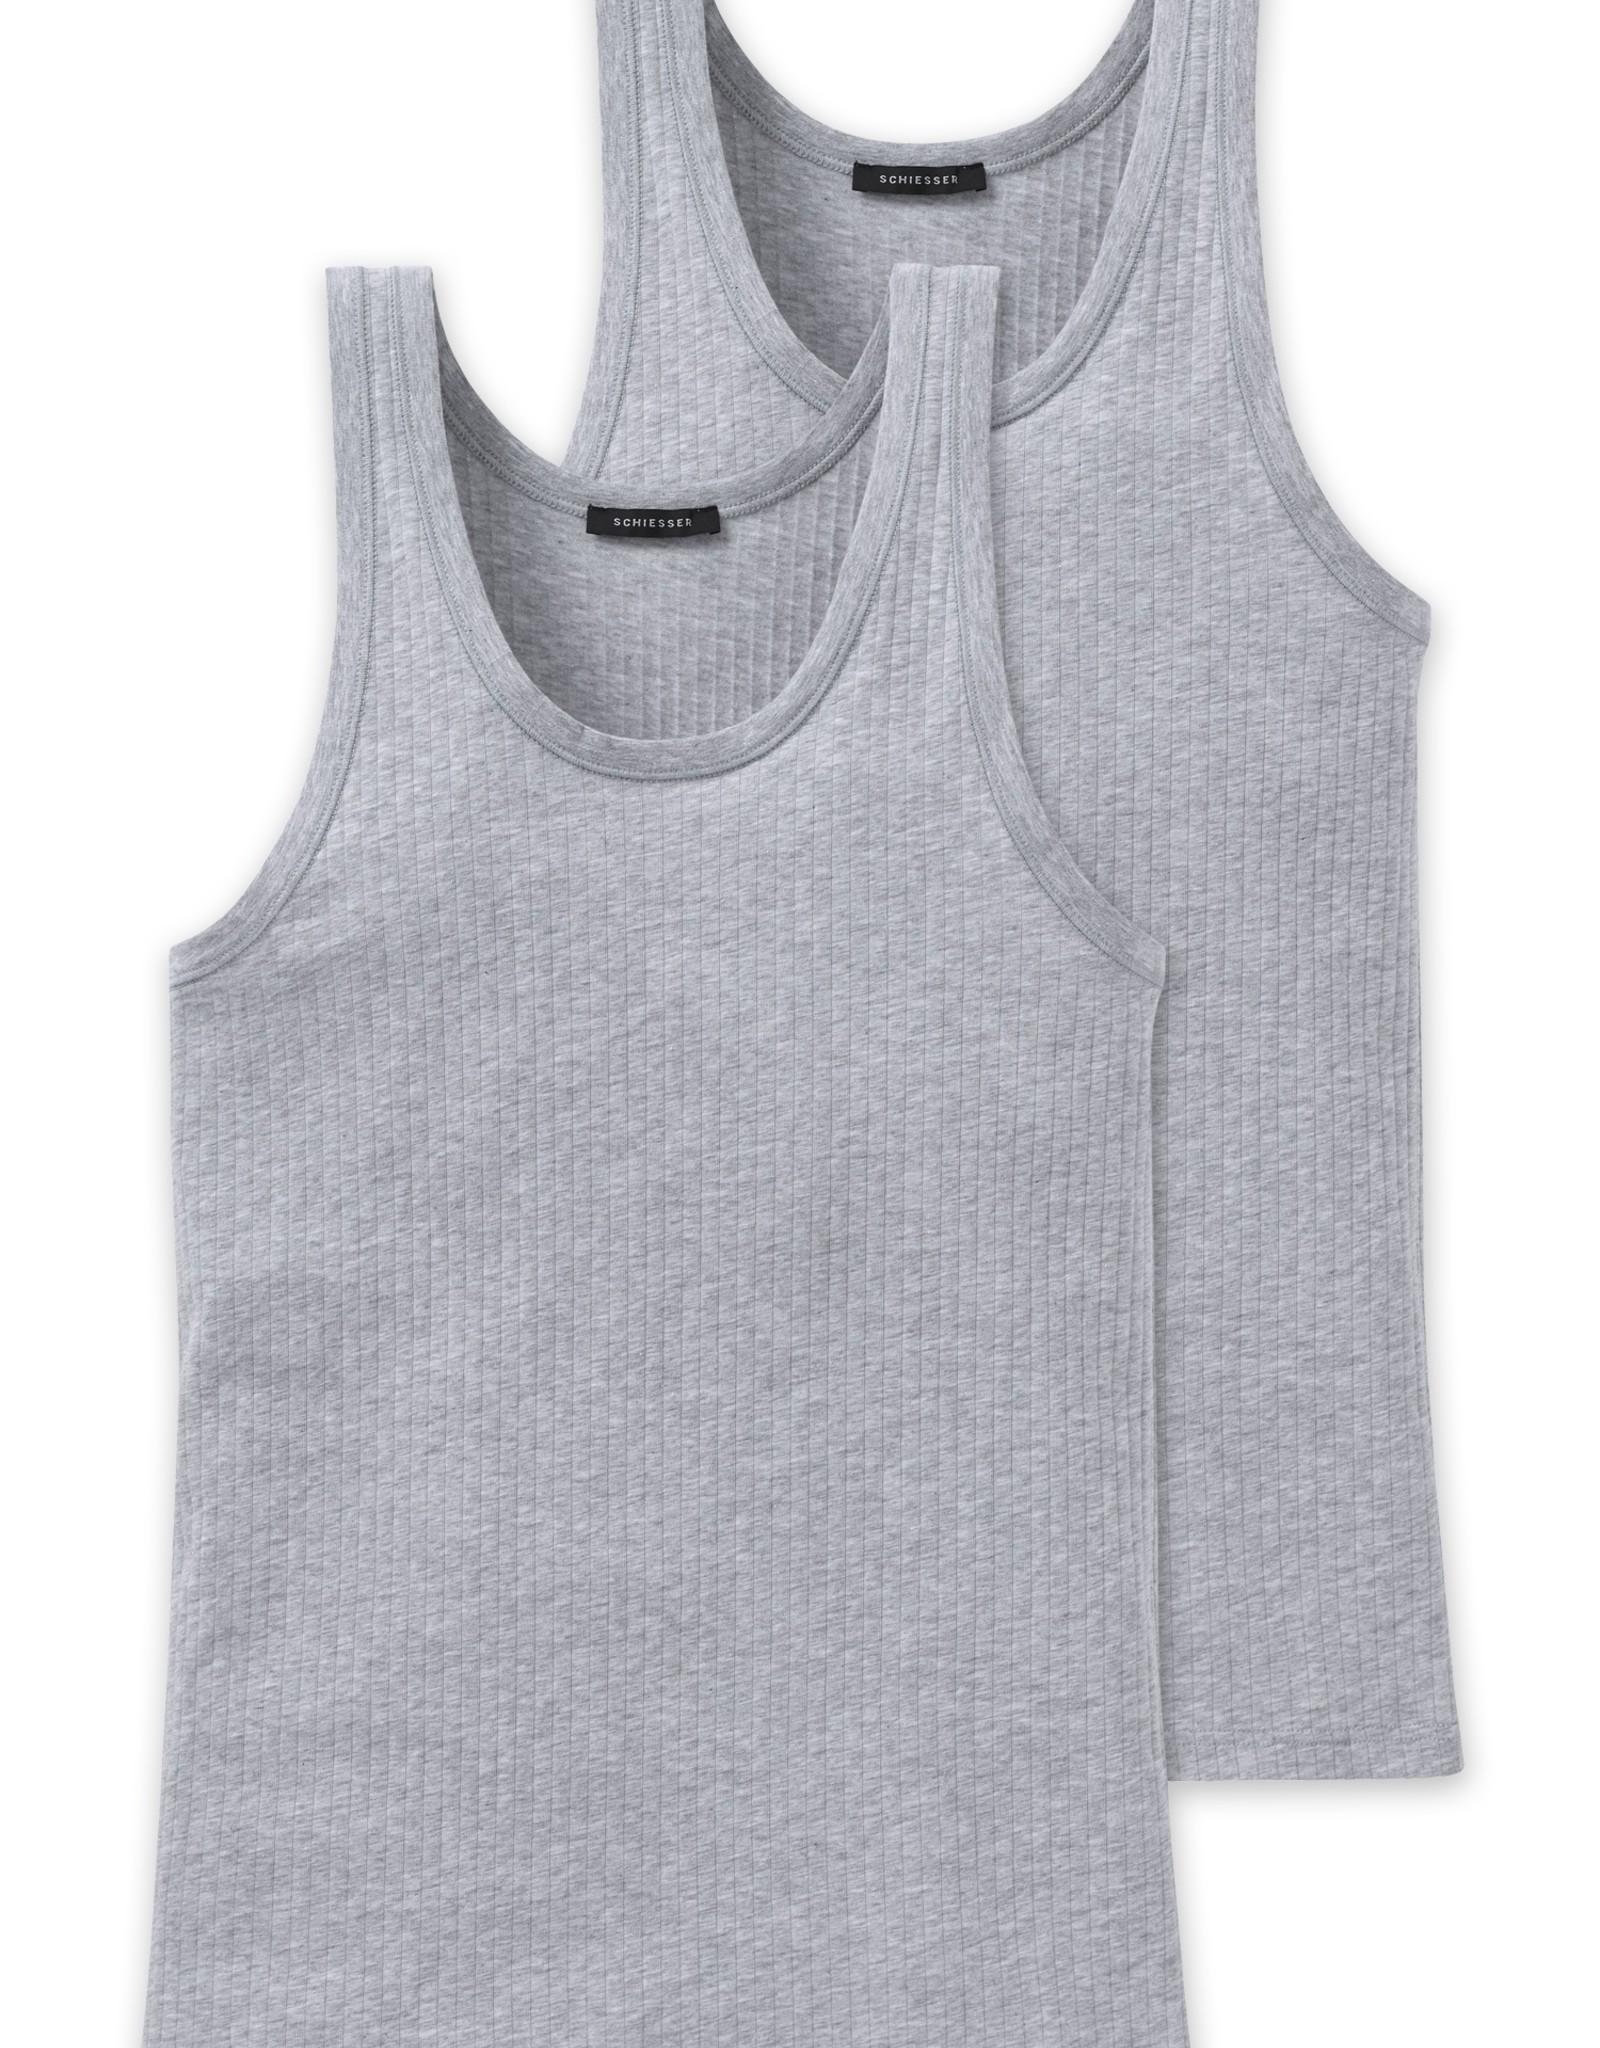 Schiesser Cotton Essentials Authentic Top 2-P, 103401